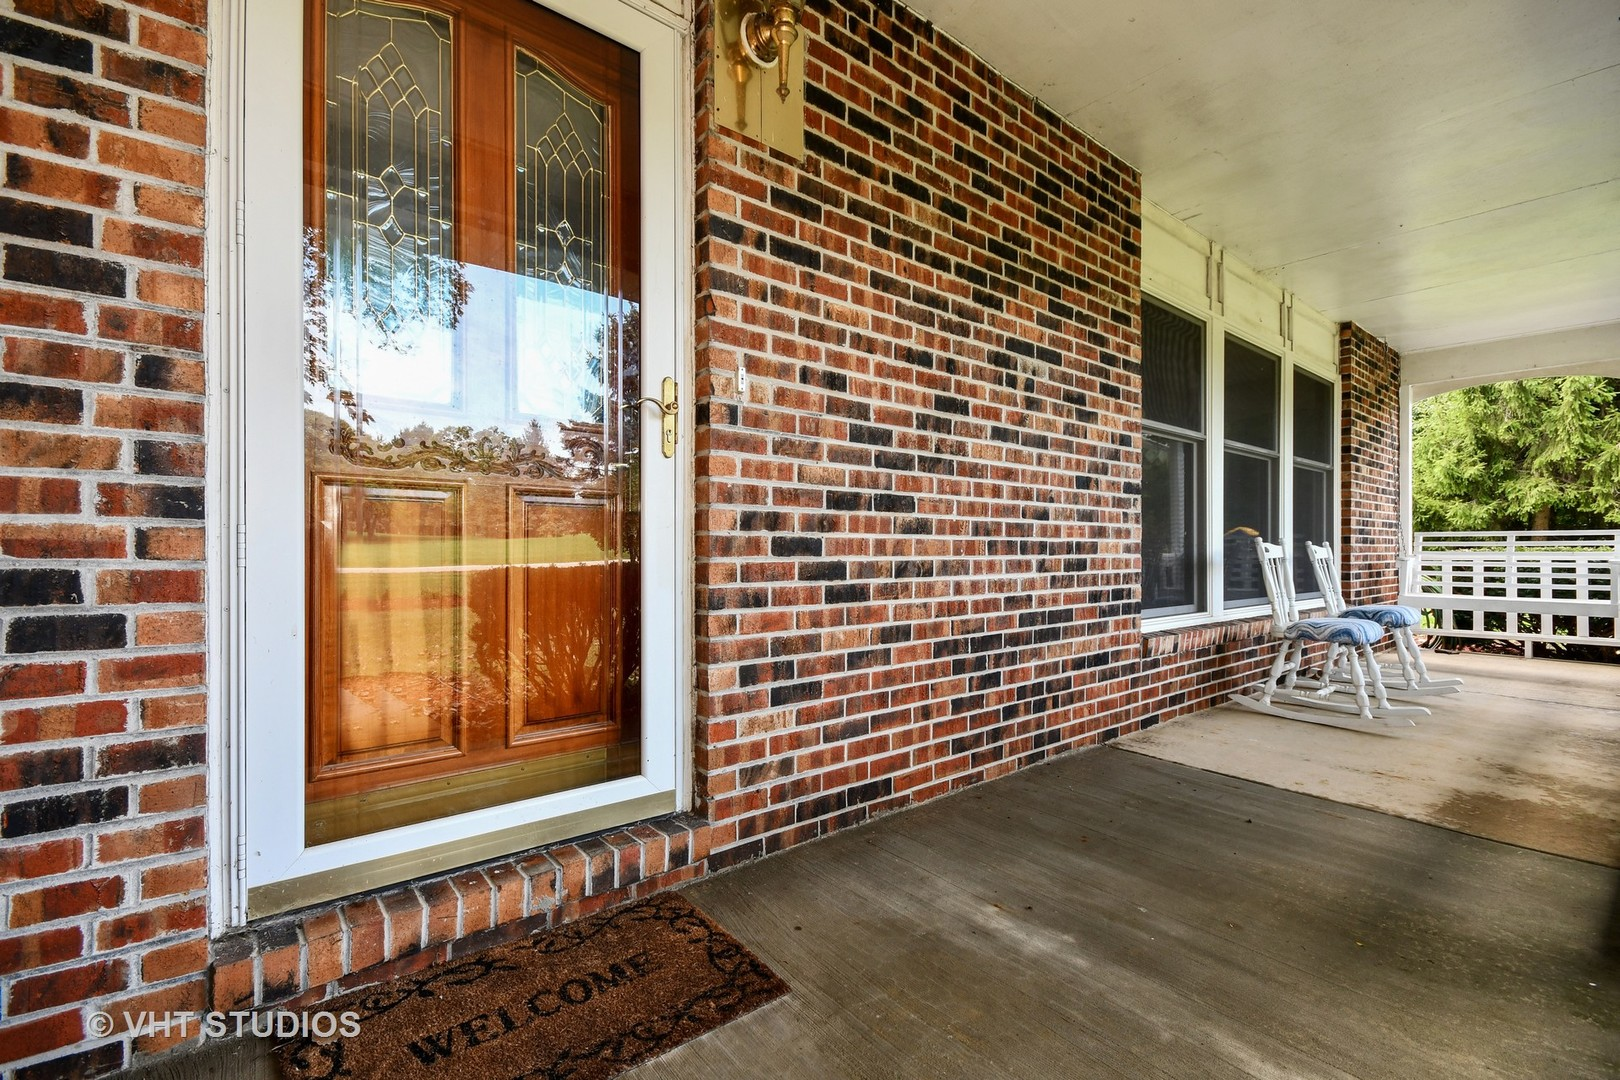 36W395 Barton, ST. CHARLES, Illinois, 60175